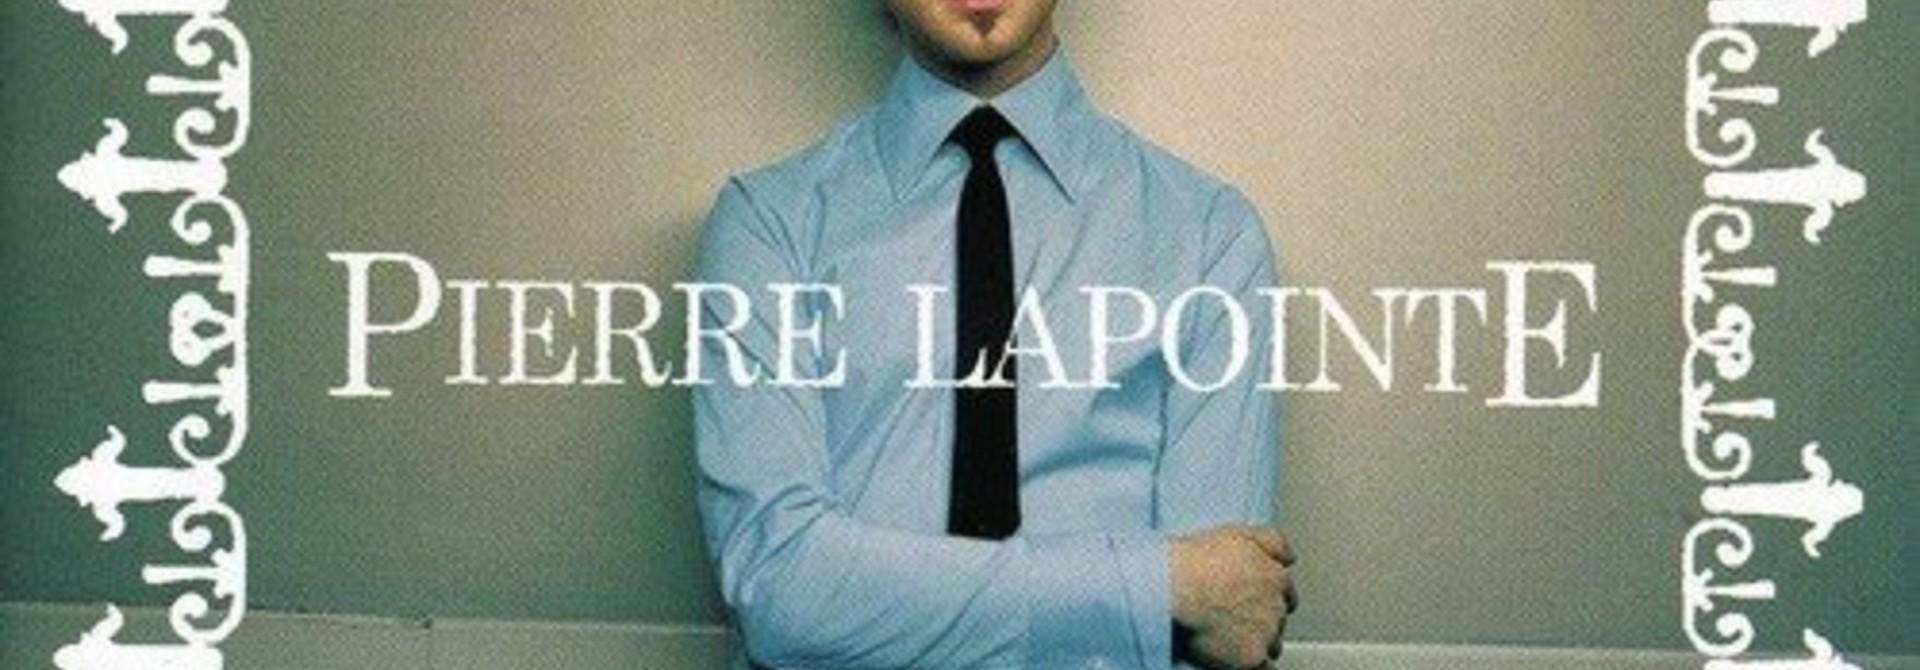 Pierre Lapointe • Pierre Lapointe